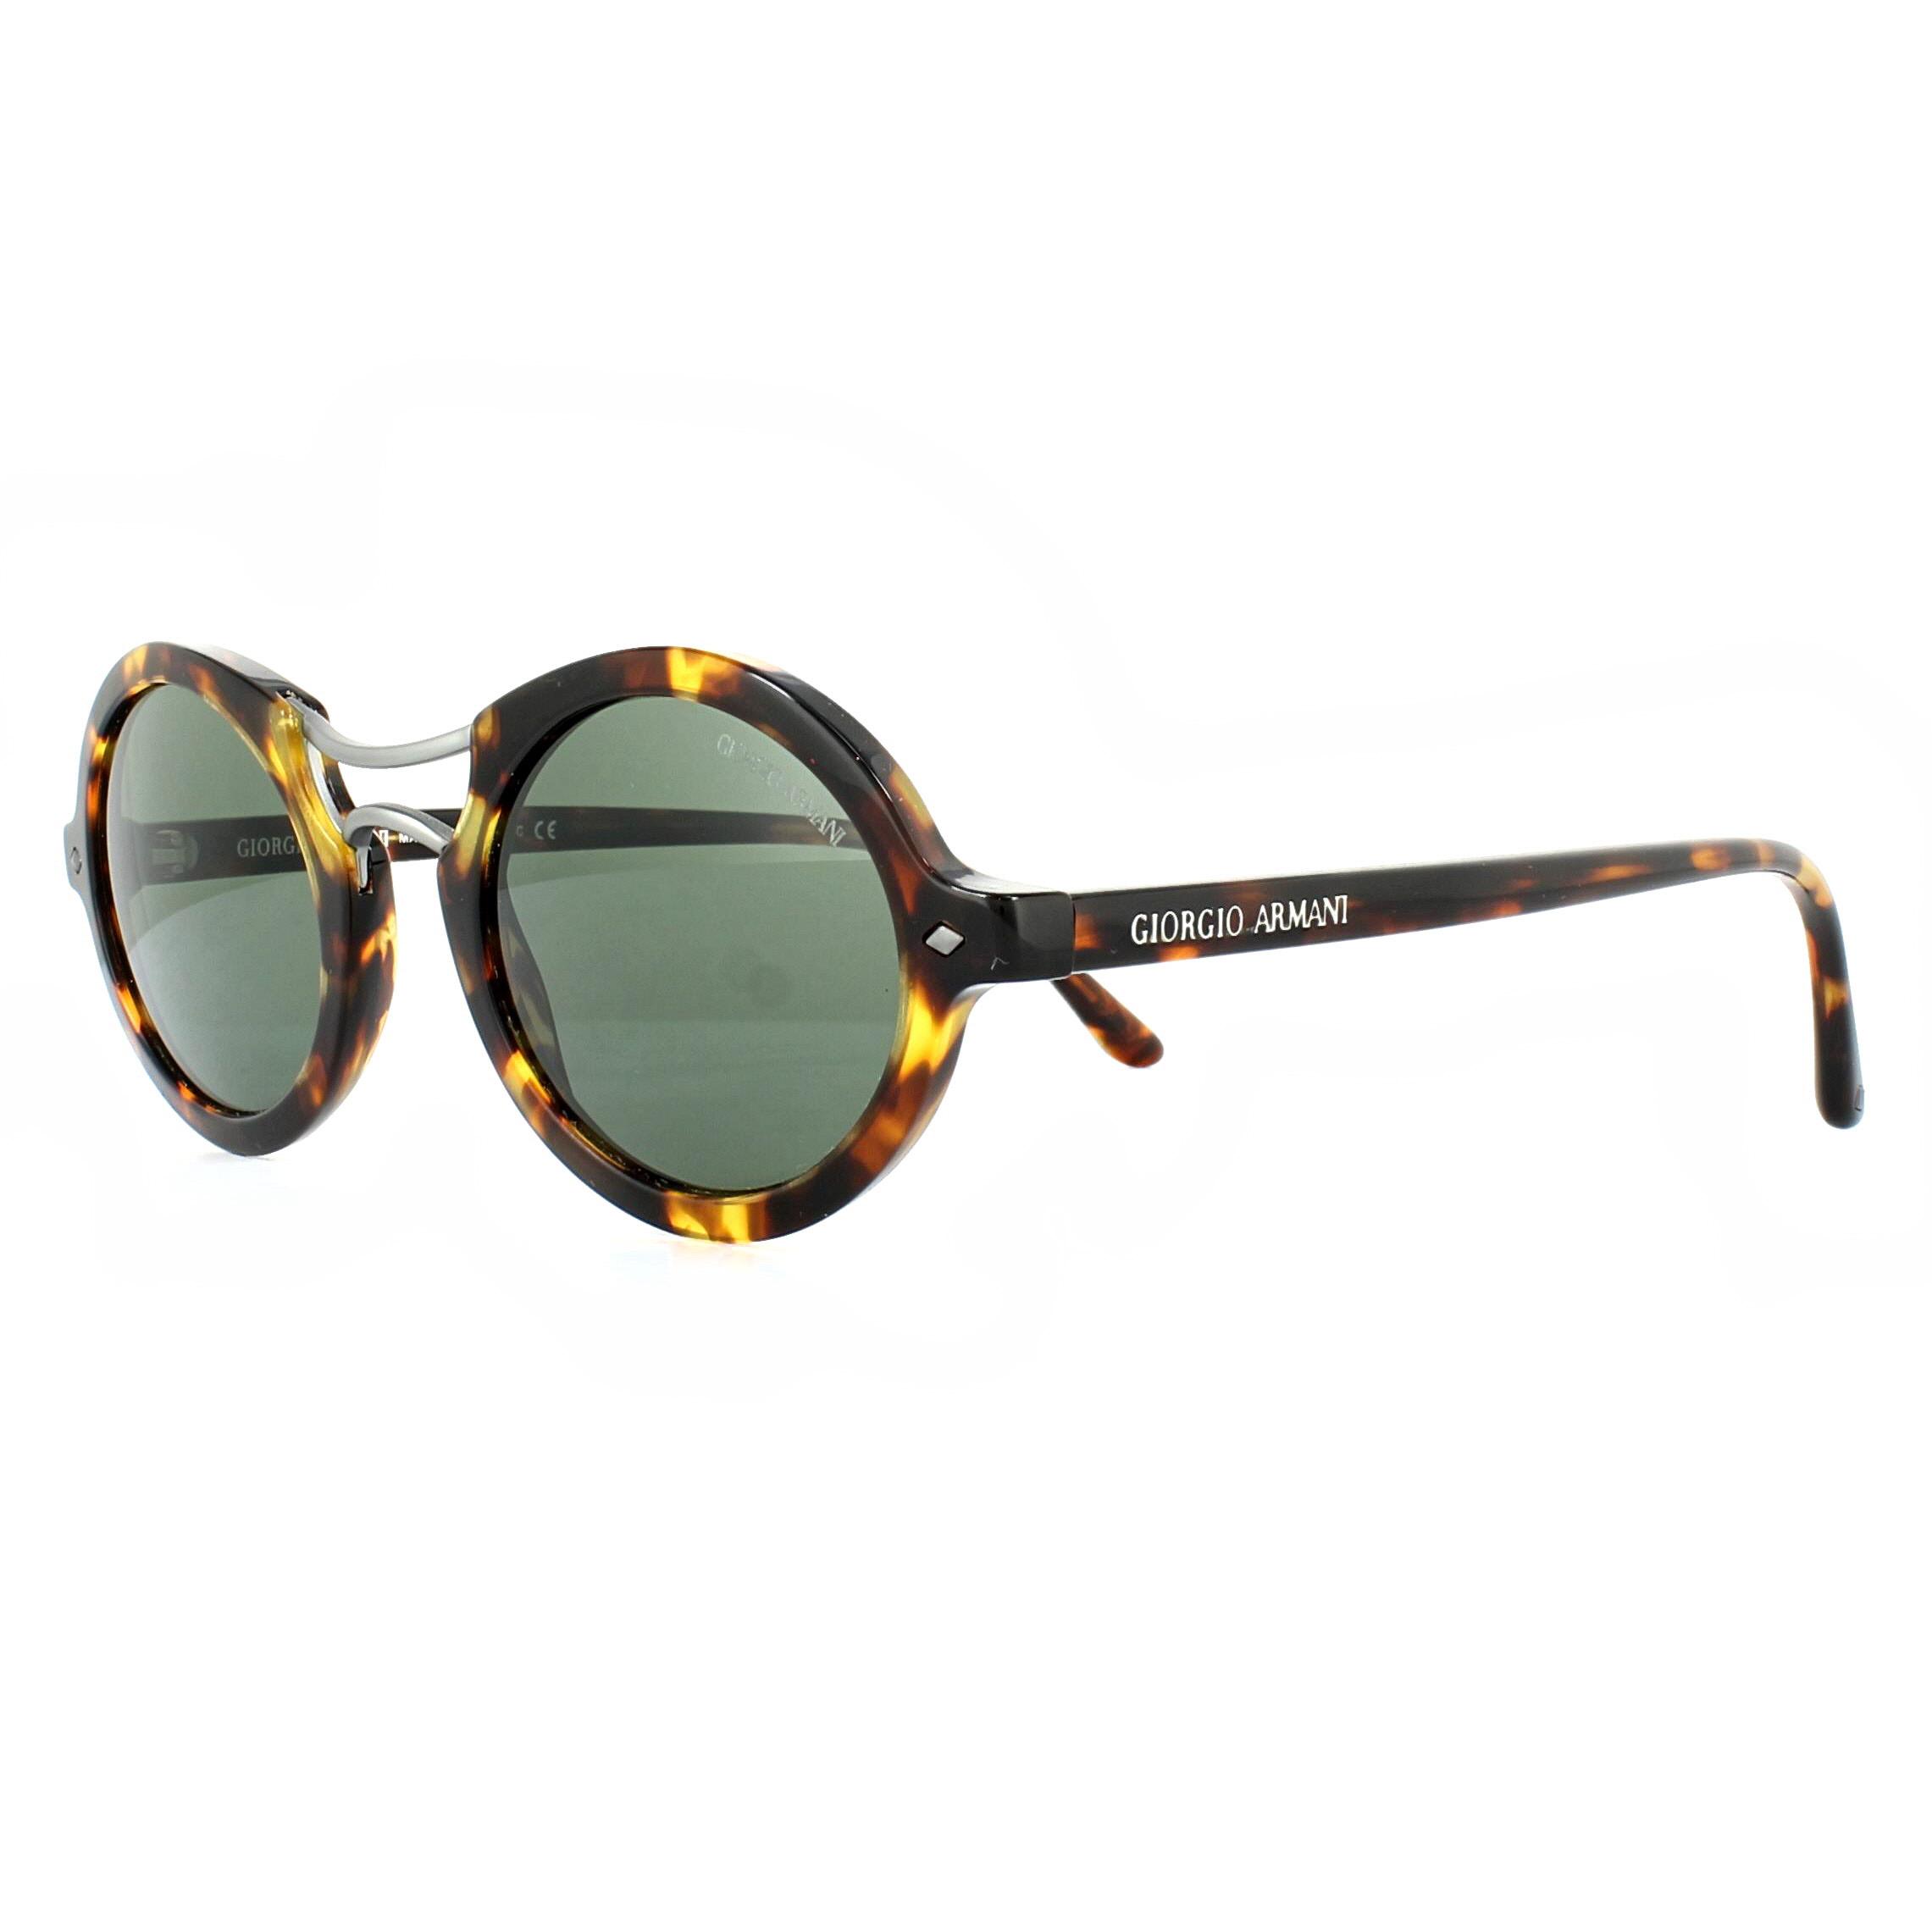 7ea22c17cdb1 Sentinel Giorgio Armani Sunglasses AR8072 509231 Yellow Havana Green